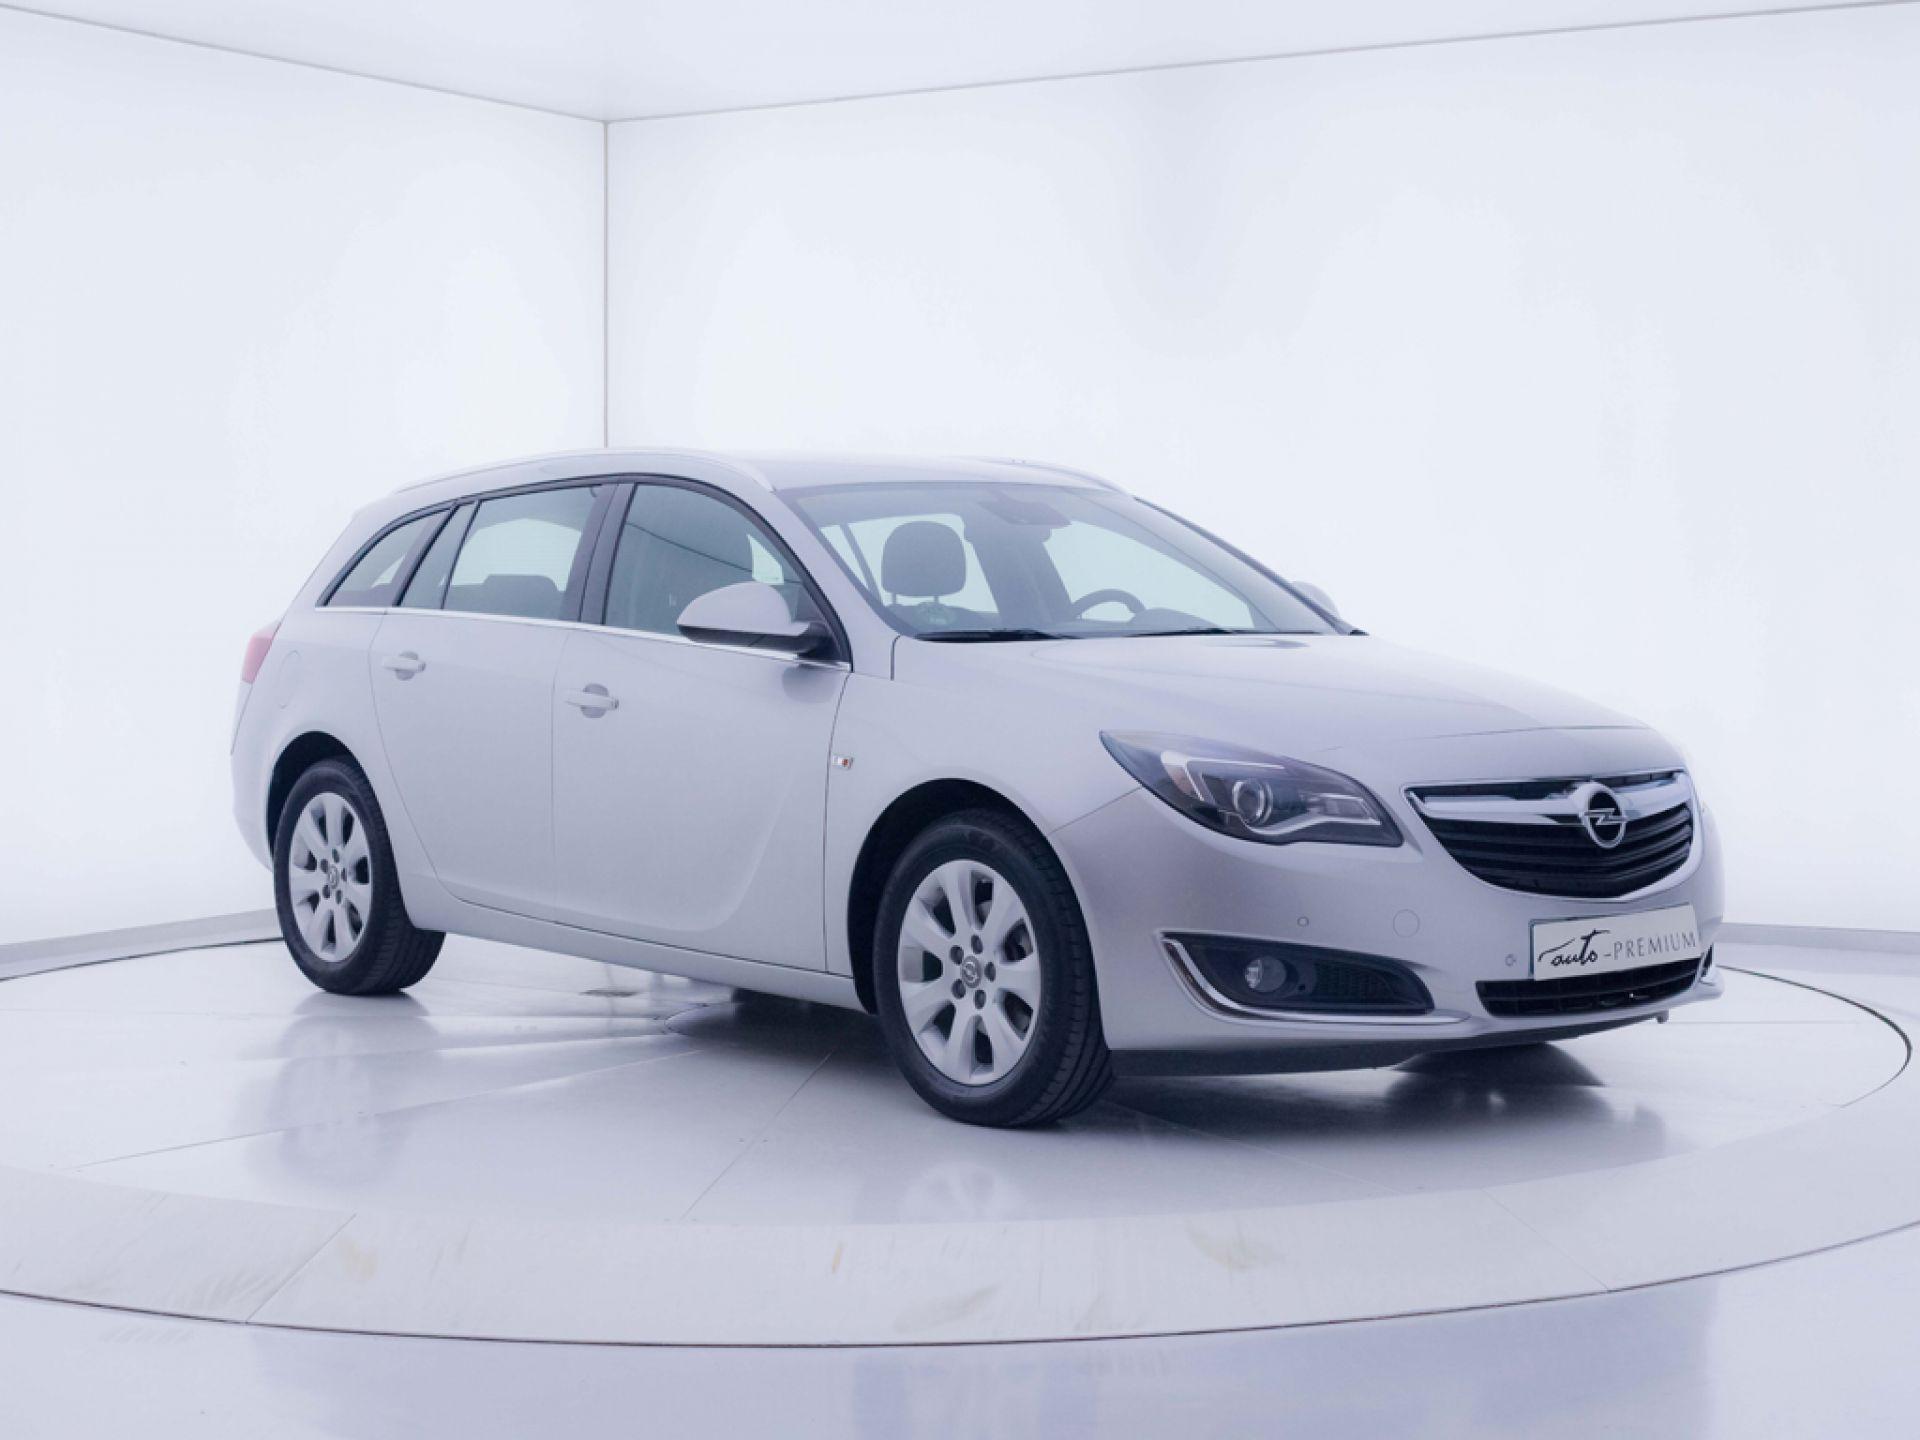 Opel Insignia ST 1.6 CDTI S&S (120CV) Business